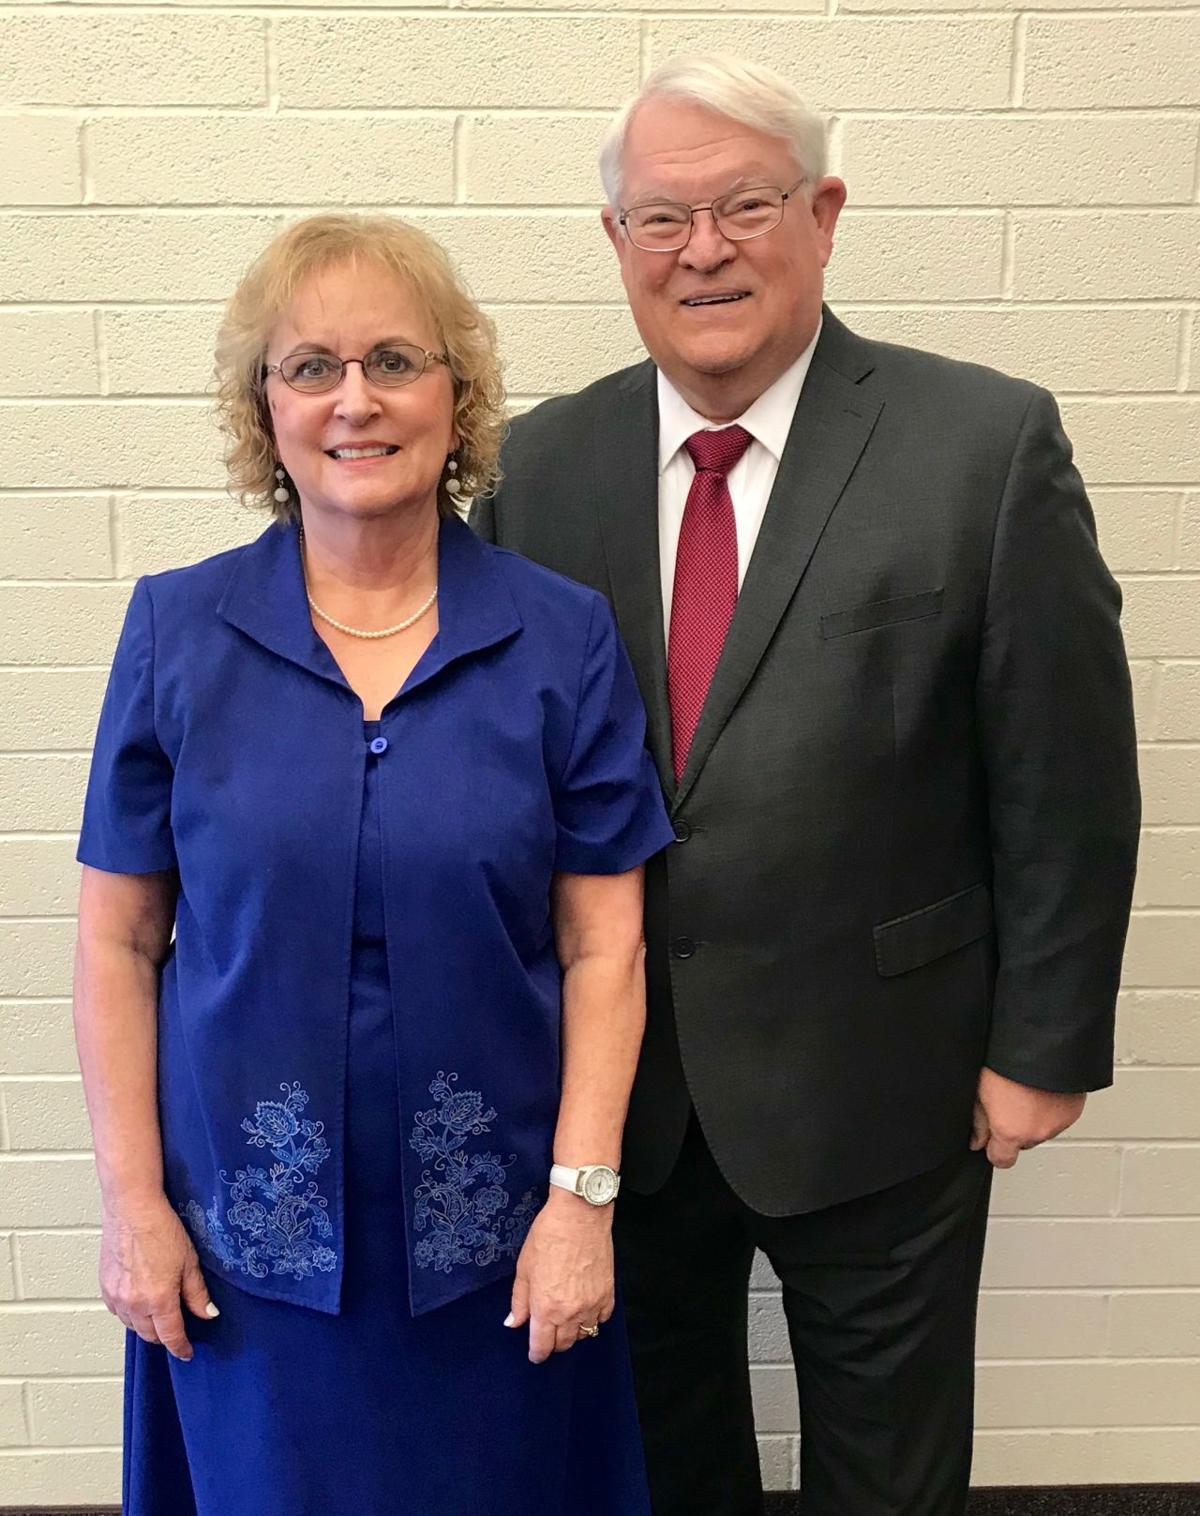 Ursula and Dennis Byington